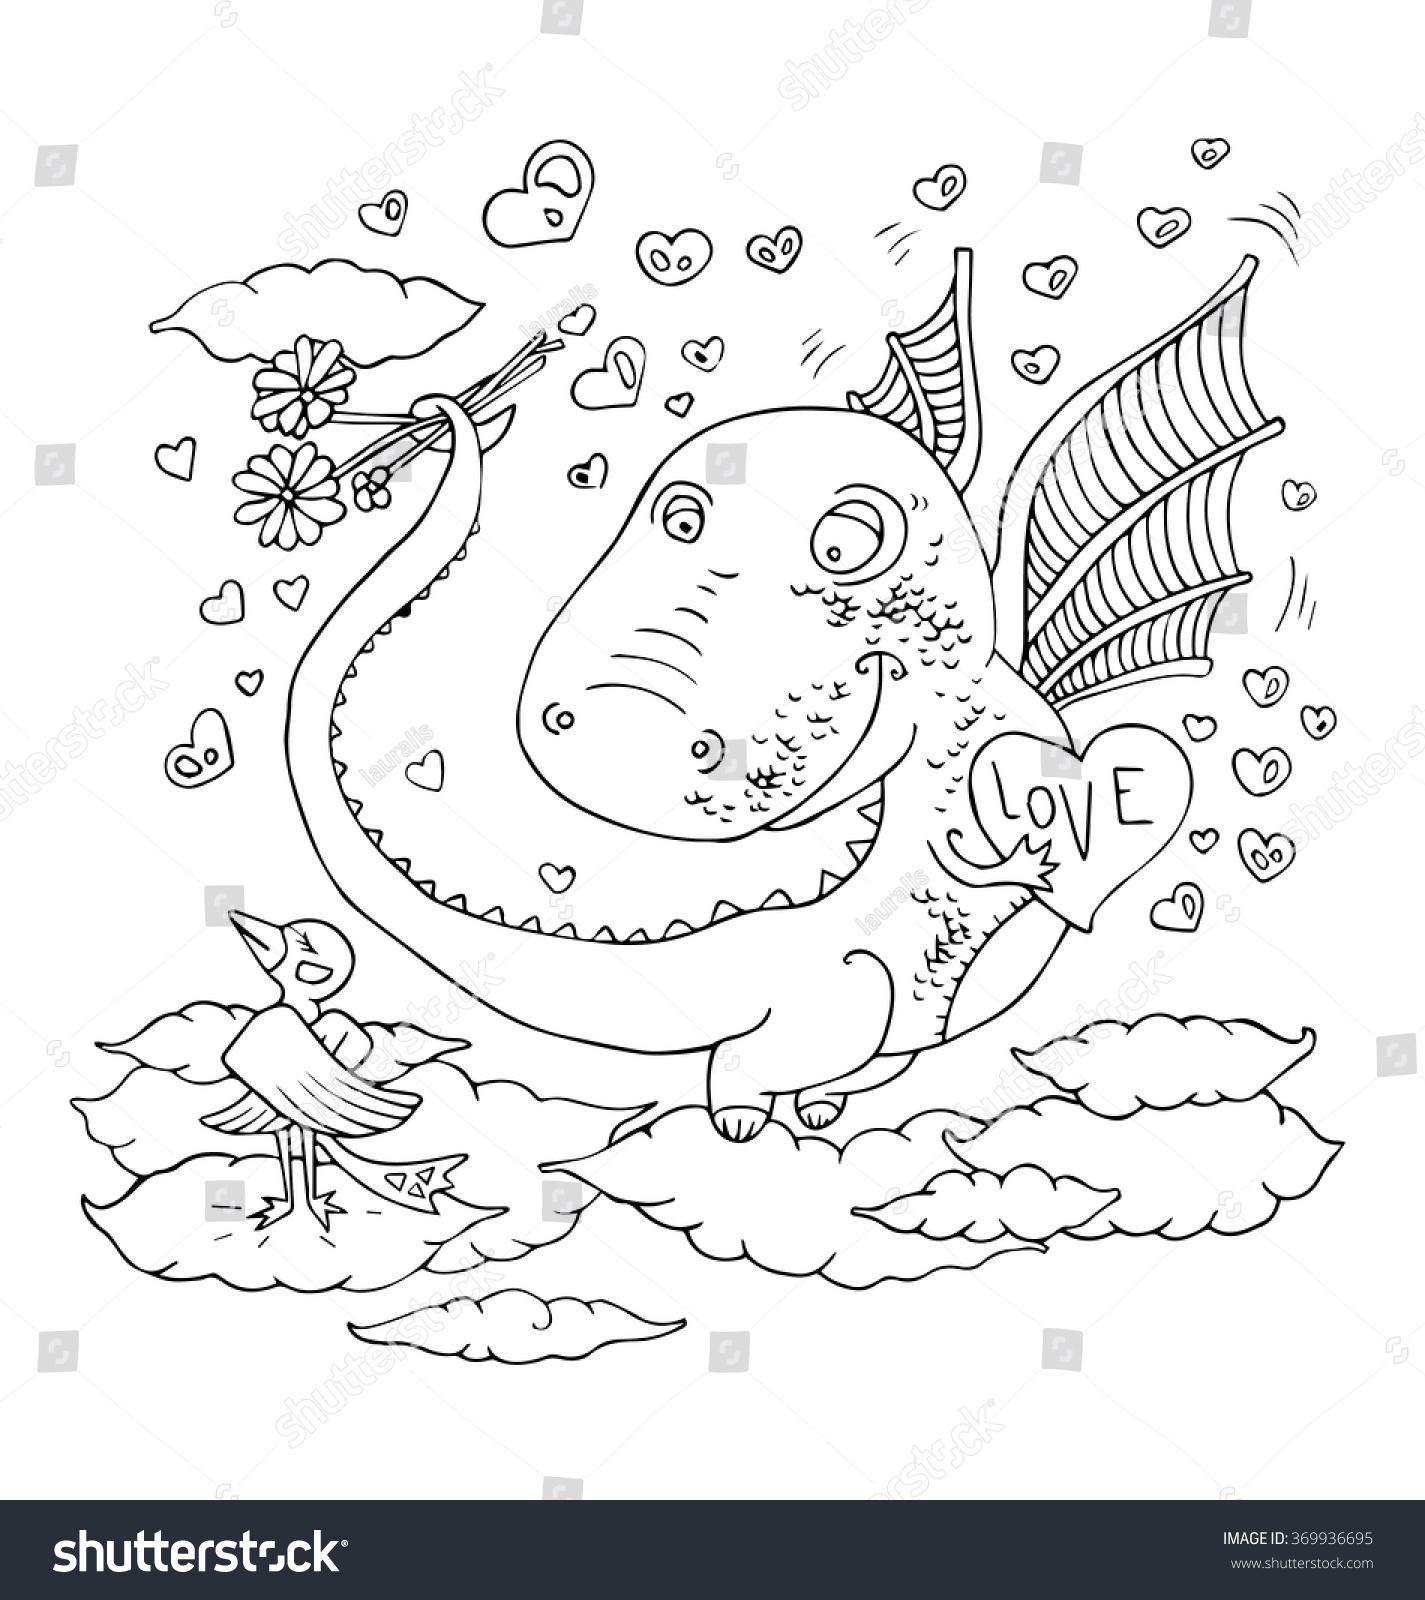 Valentines heart dragon symbols chinese horoscope stock vector the valentines heart for dragon symbols of chinese horoscope of the year cartoon hand drawn outline buycottarizona Gallery